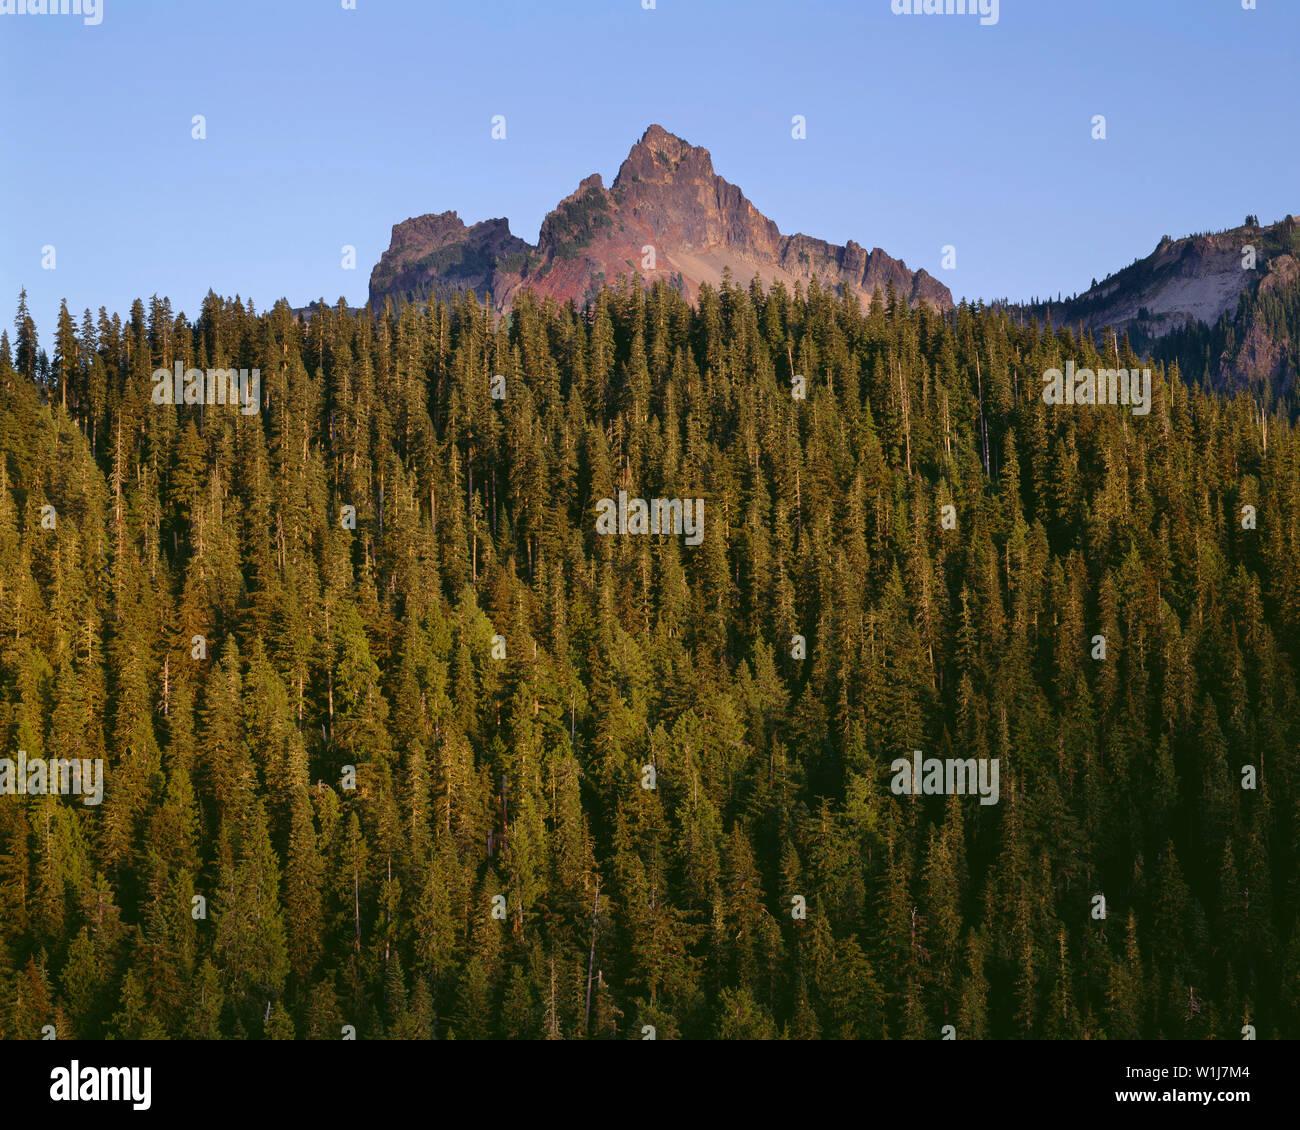 USA, Washington, Mt. Rainier National Park, Pinnacle Peak rises above surrounding evergreen forest. - Stock Image